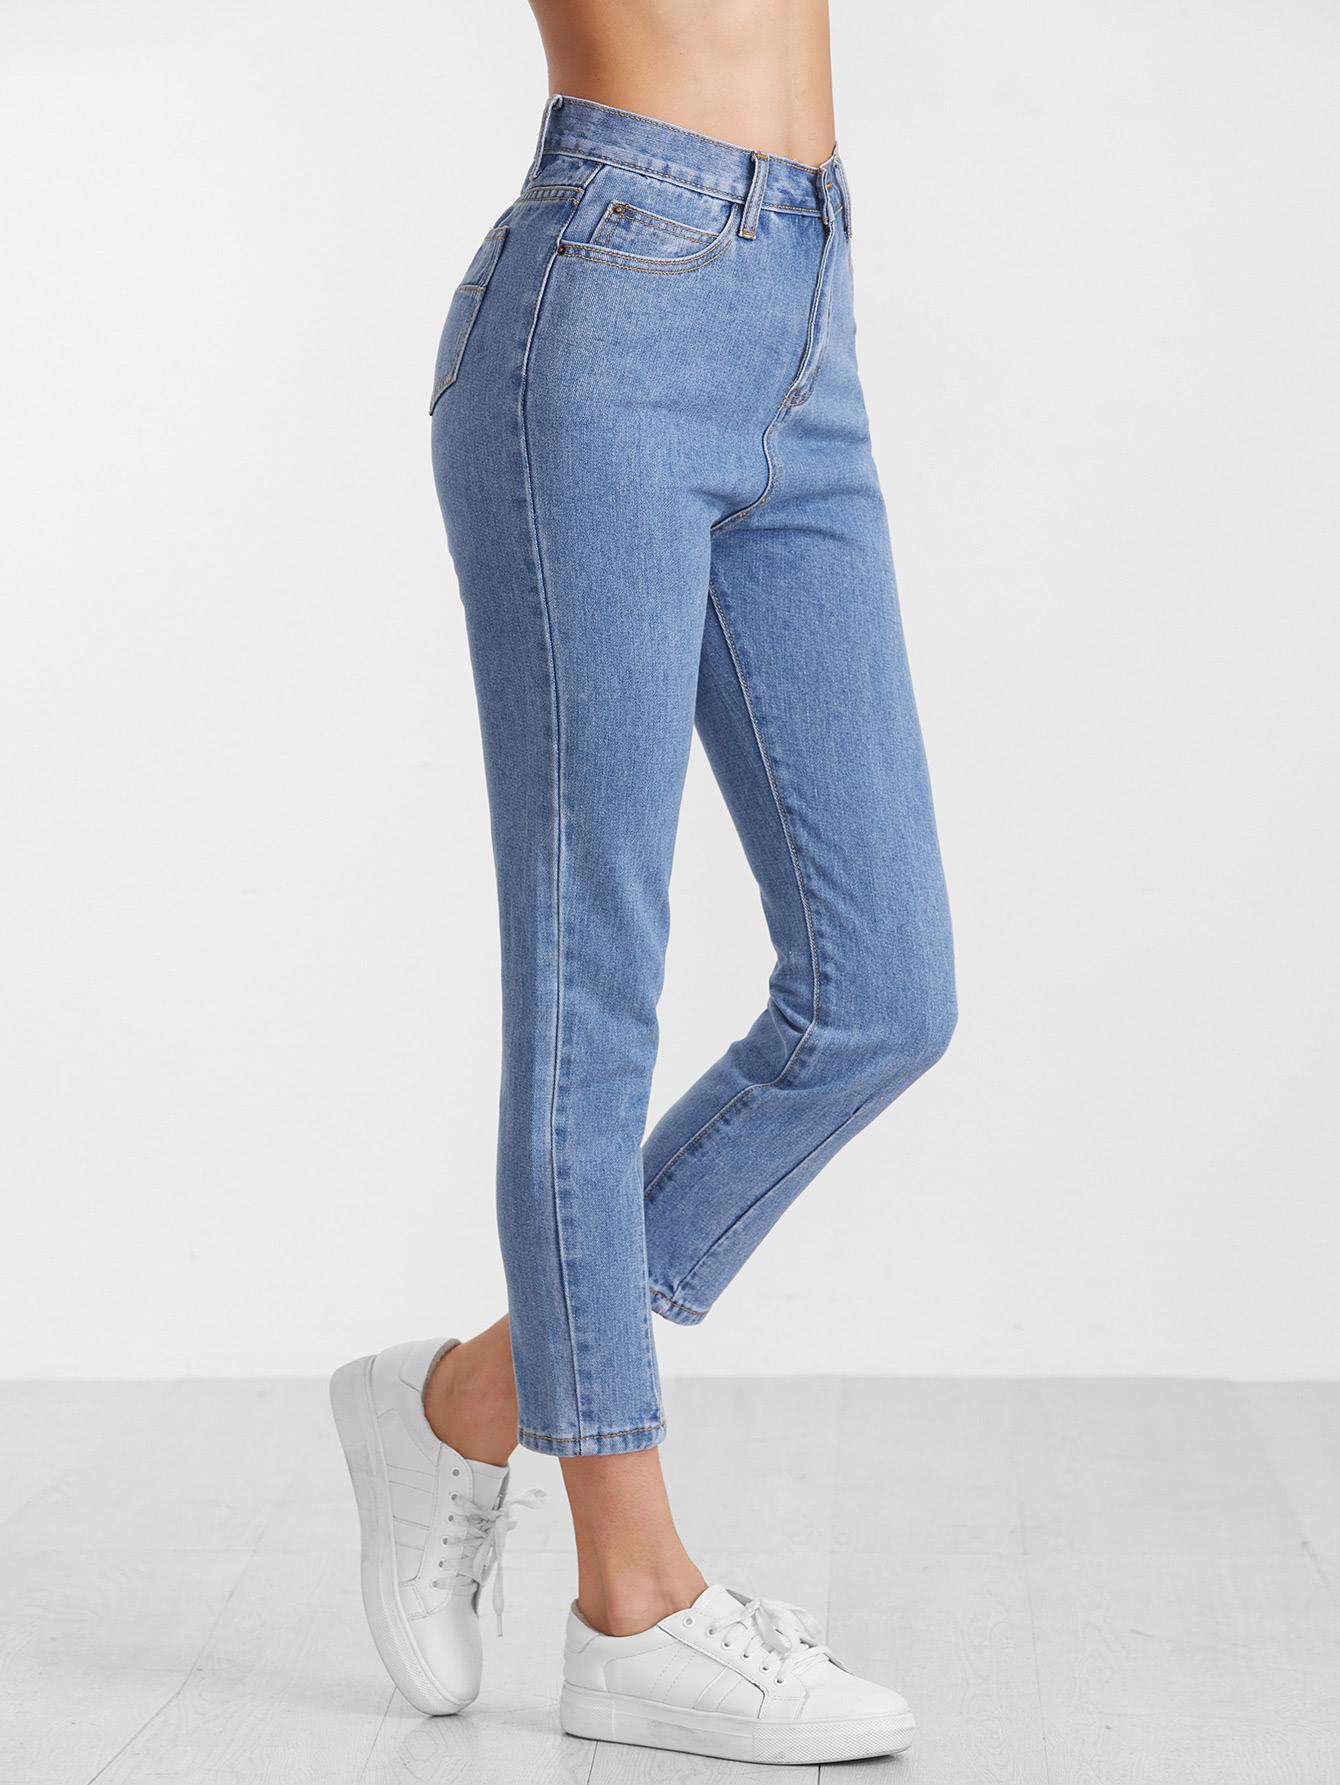 Blue High Waist Casual Jeans